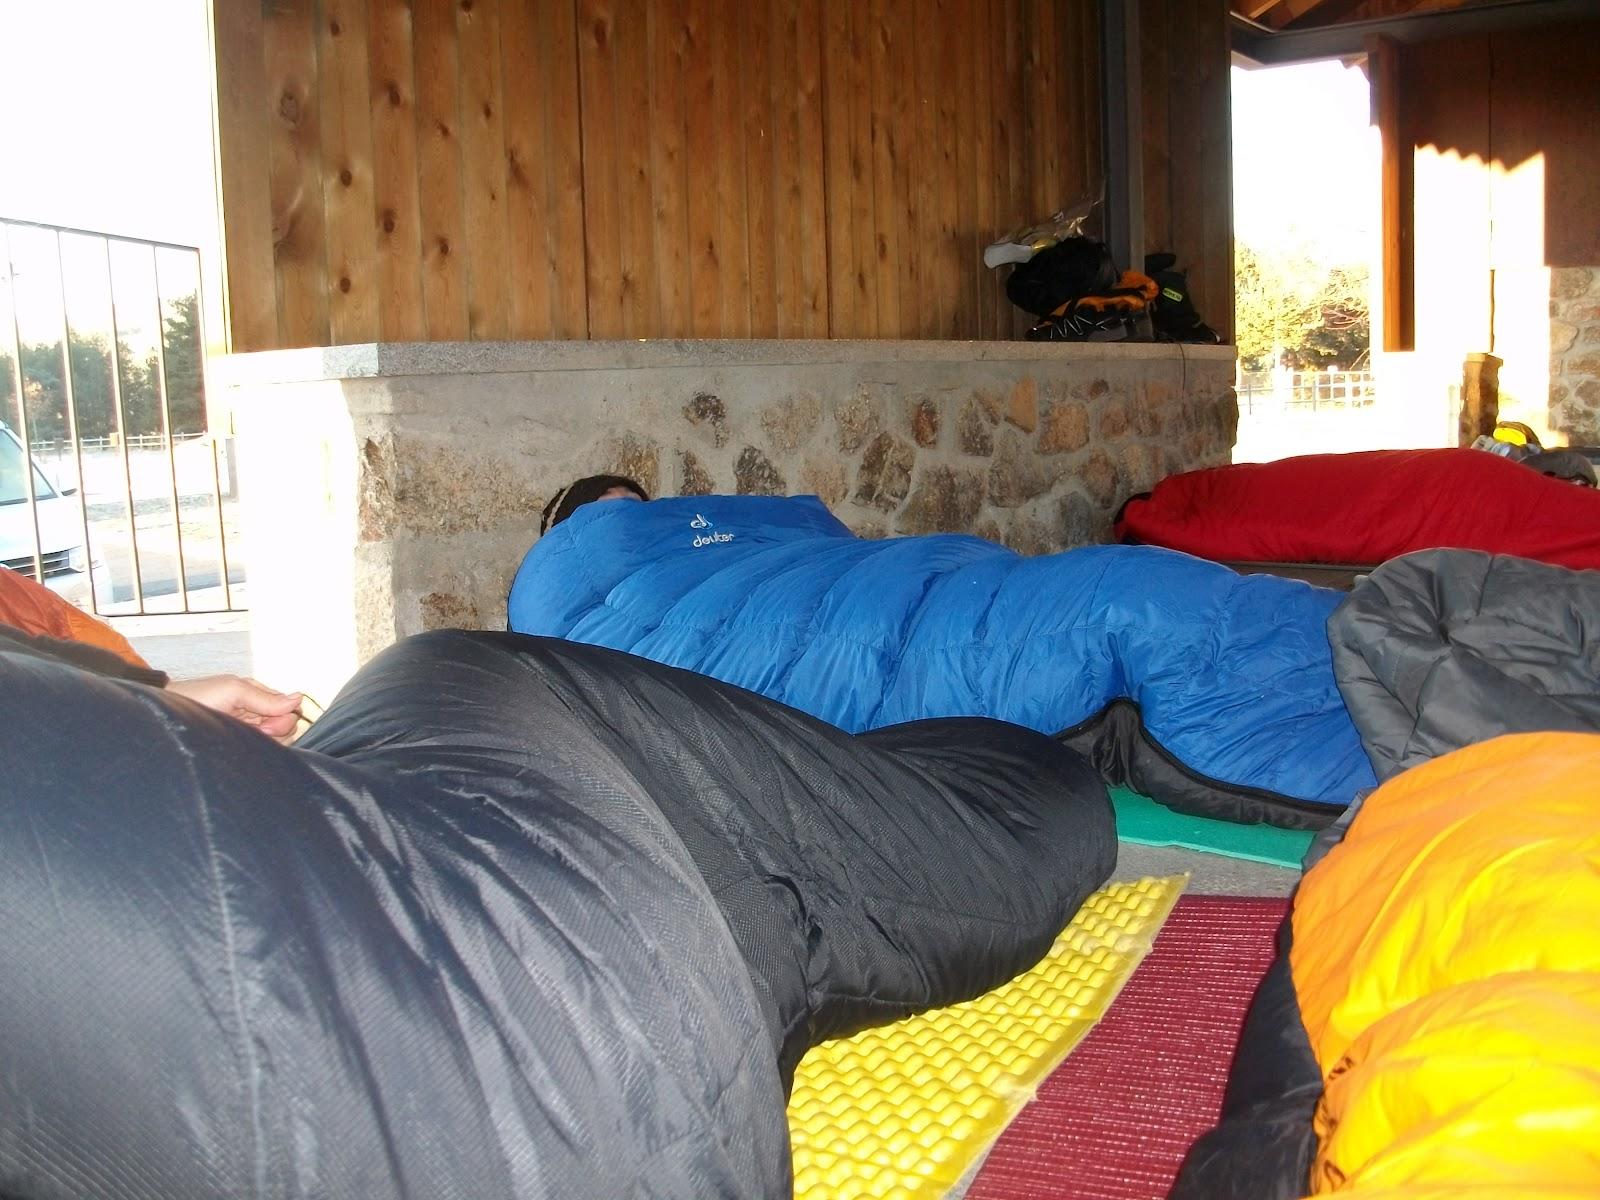 Clube de montanhismo de braga sacos cama ou sacos de dormir for Camas de dormir